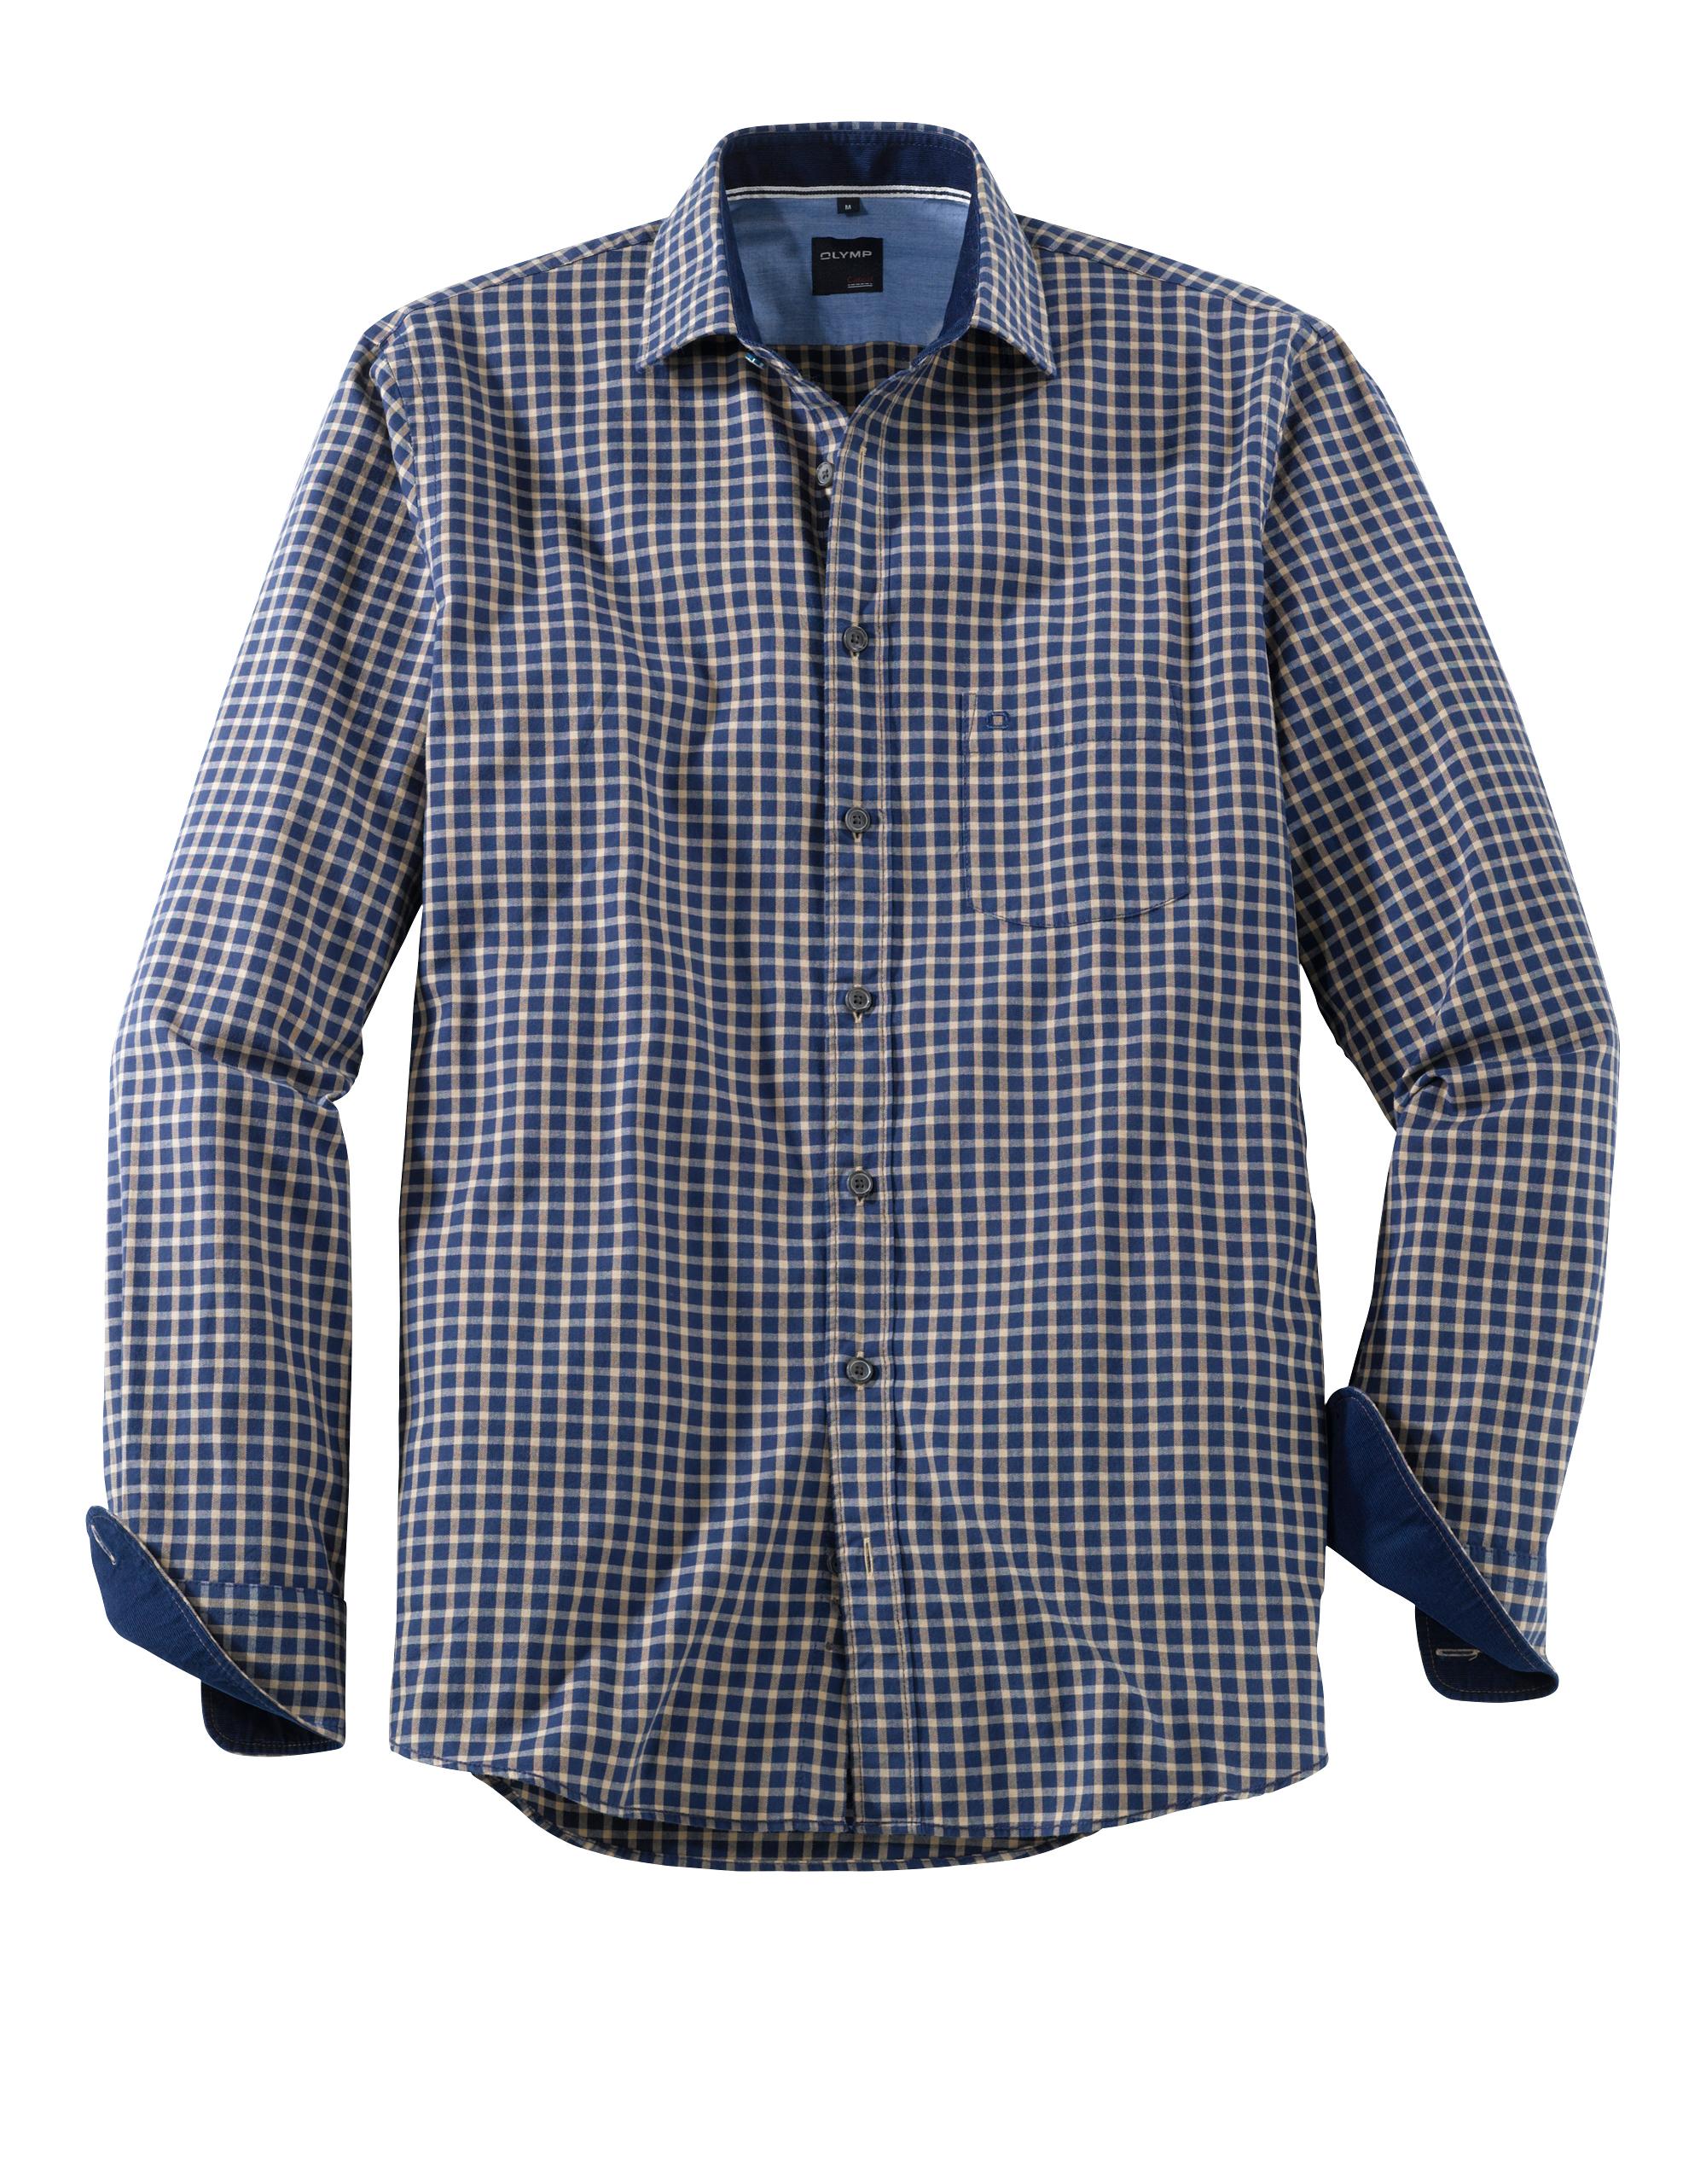 OLYMP Casual Hemd, modern fit, Kent, Braun, S   Bekleidung > Hemden > Sonstige Hemden   Braun   100% baumwolle   OLYMP Casual